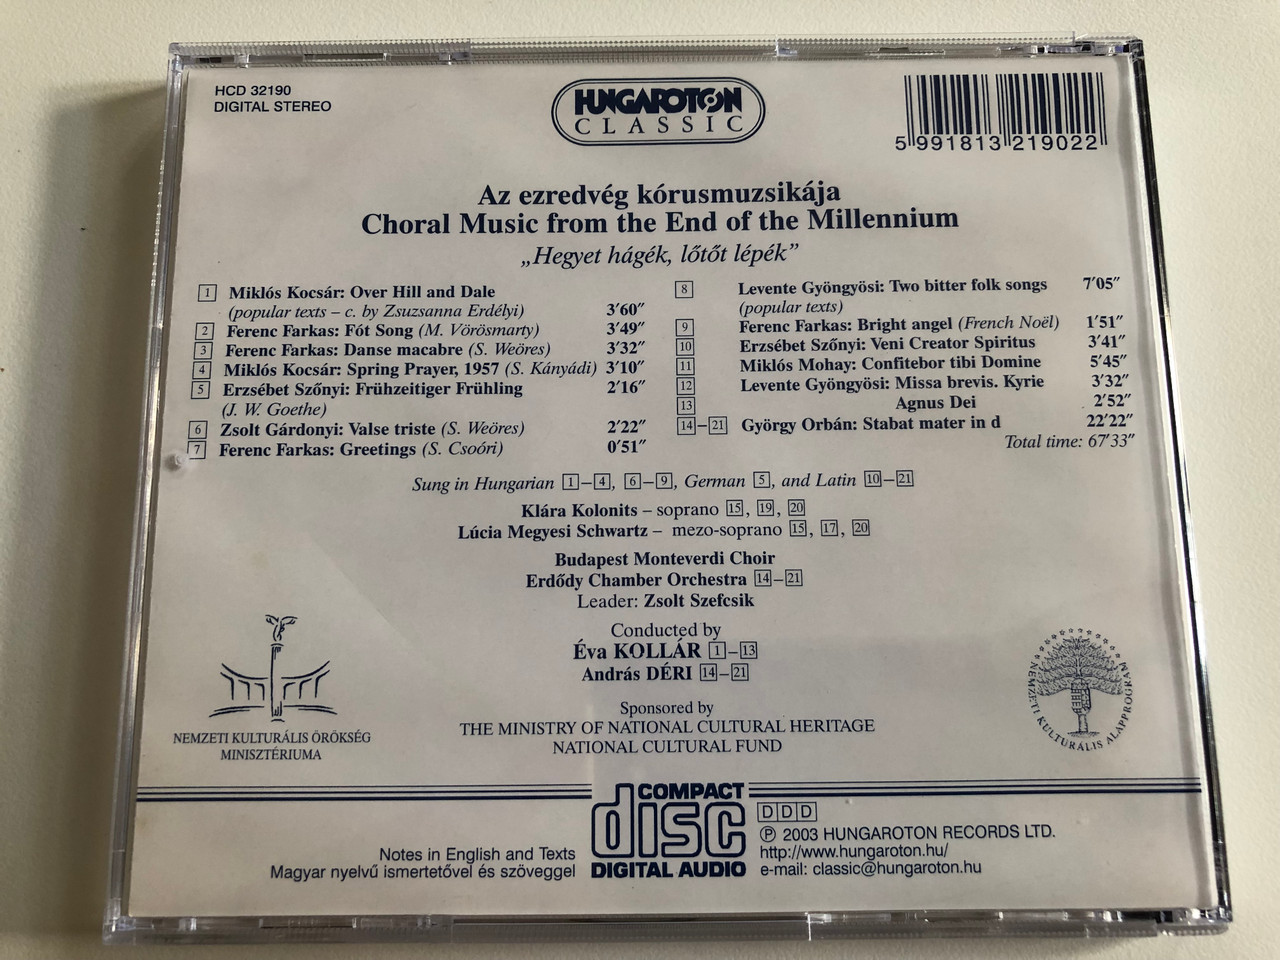 https://cdn10.bigcommerce.com/s-62bdpkt7pb/products/0/images/188447/Choral_Music_from_the_End_of_the_Milennium_-_Hegyet_hagek_lotot_lepek_Budapest_Monteverdi_Choir_Erdody_Chamber_Orchestra_Leader_Zsolt_Szefcsik_Conducted_by_Eva_Kollar_Andras_Deri_8__23300.1629473907.1280.1280.JPG?c=2&_gl=1*o7p7c2*_ga*MjA2NTIxMjE2MC4xNTkwNTEyNTMy*_ga_WS2VZYPC6G*MTYyOTQ2MzgxOC40MC4xLjE2Mjk0NzM5NTYuNjA.